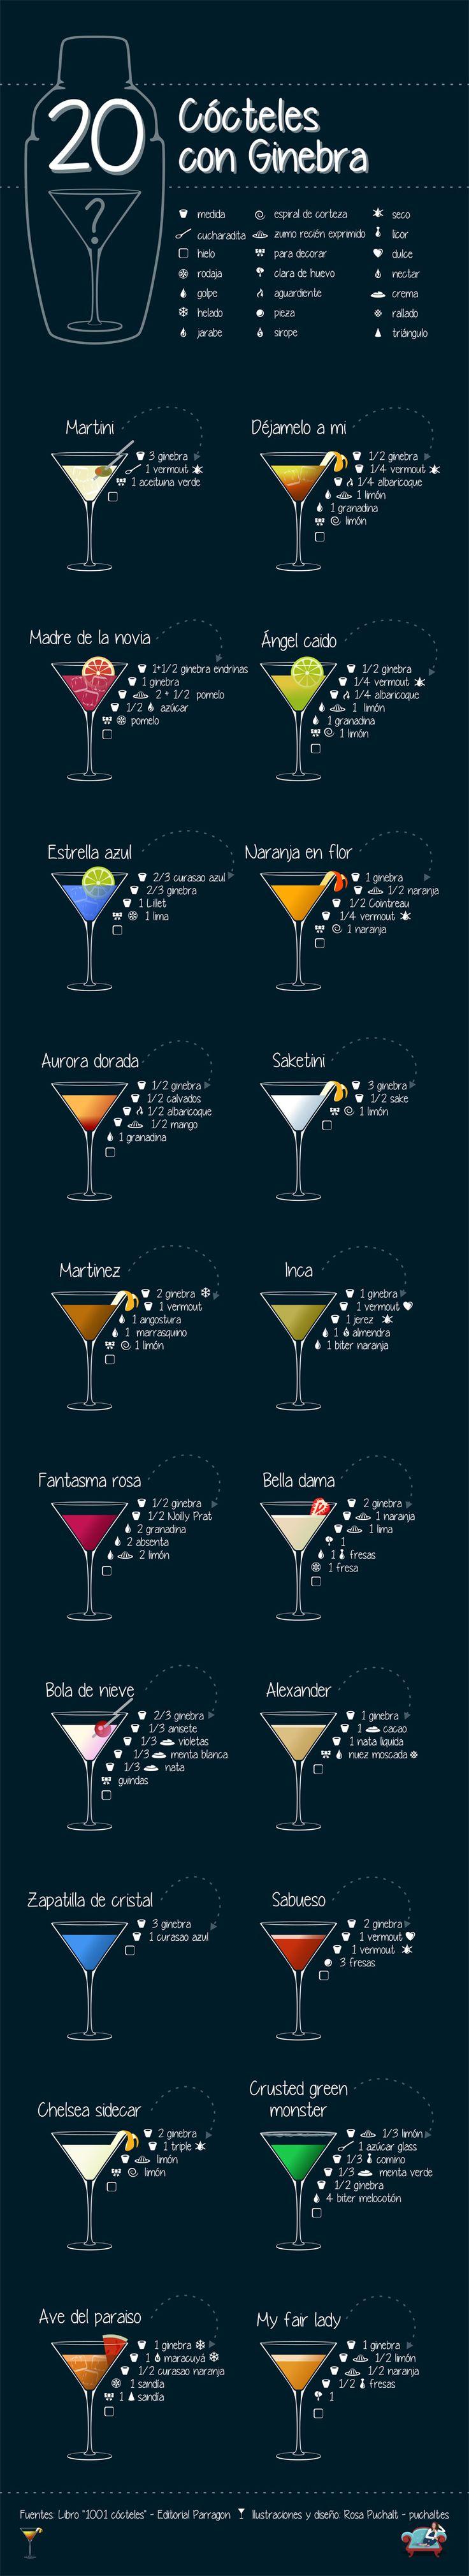 infografia_20_cocteles_con_ginebra.jpg 800×4,391 píxeles